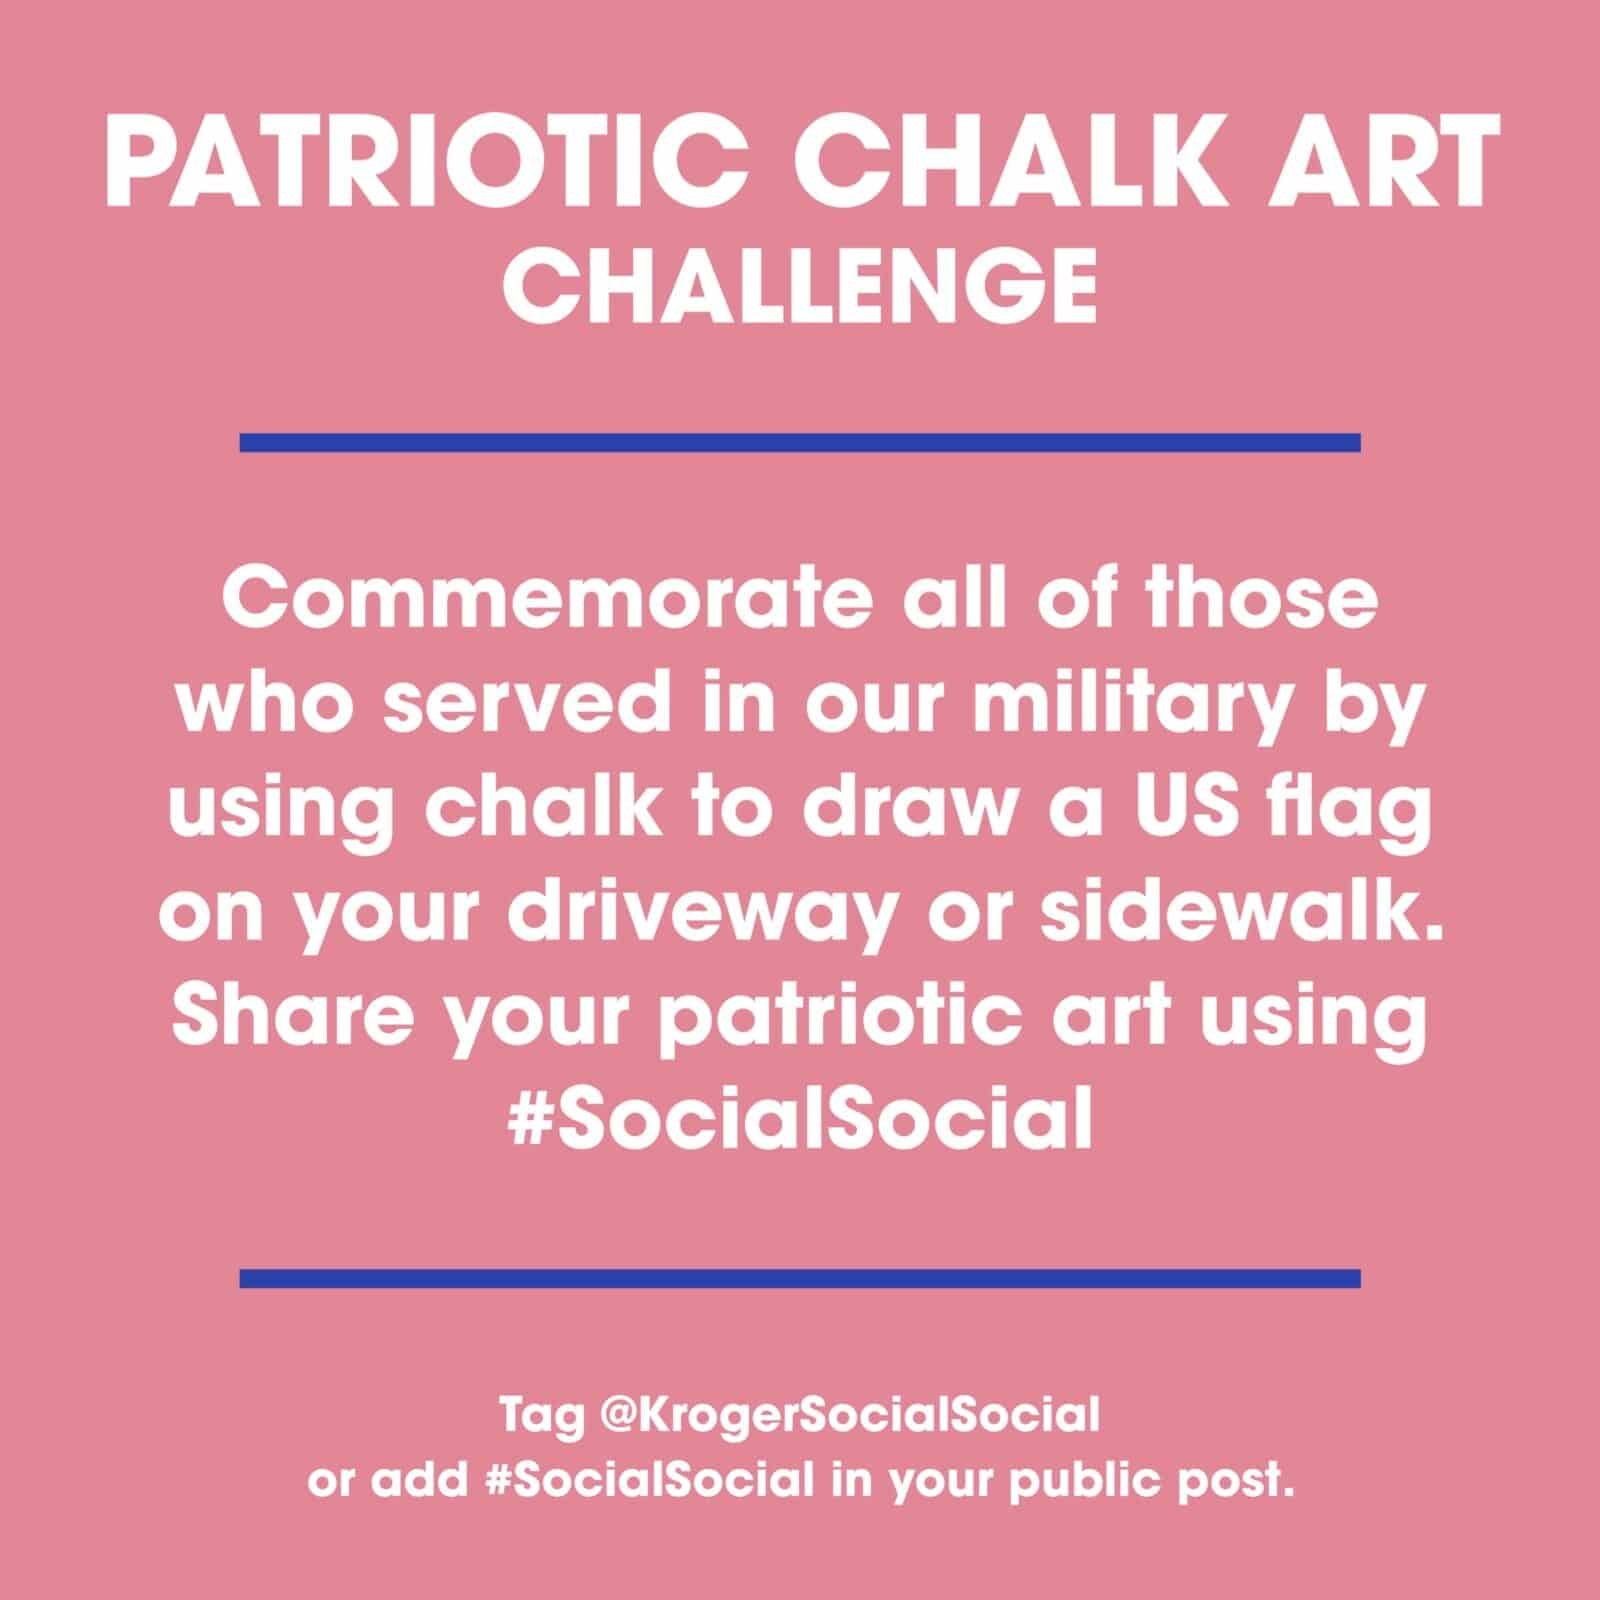 Patriotic Chalk Art Challenge